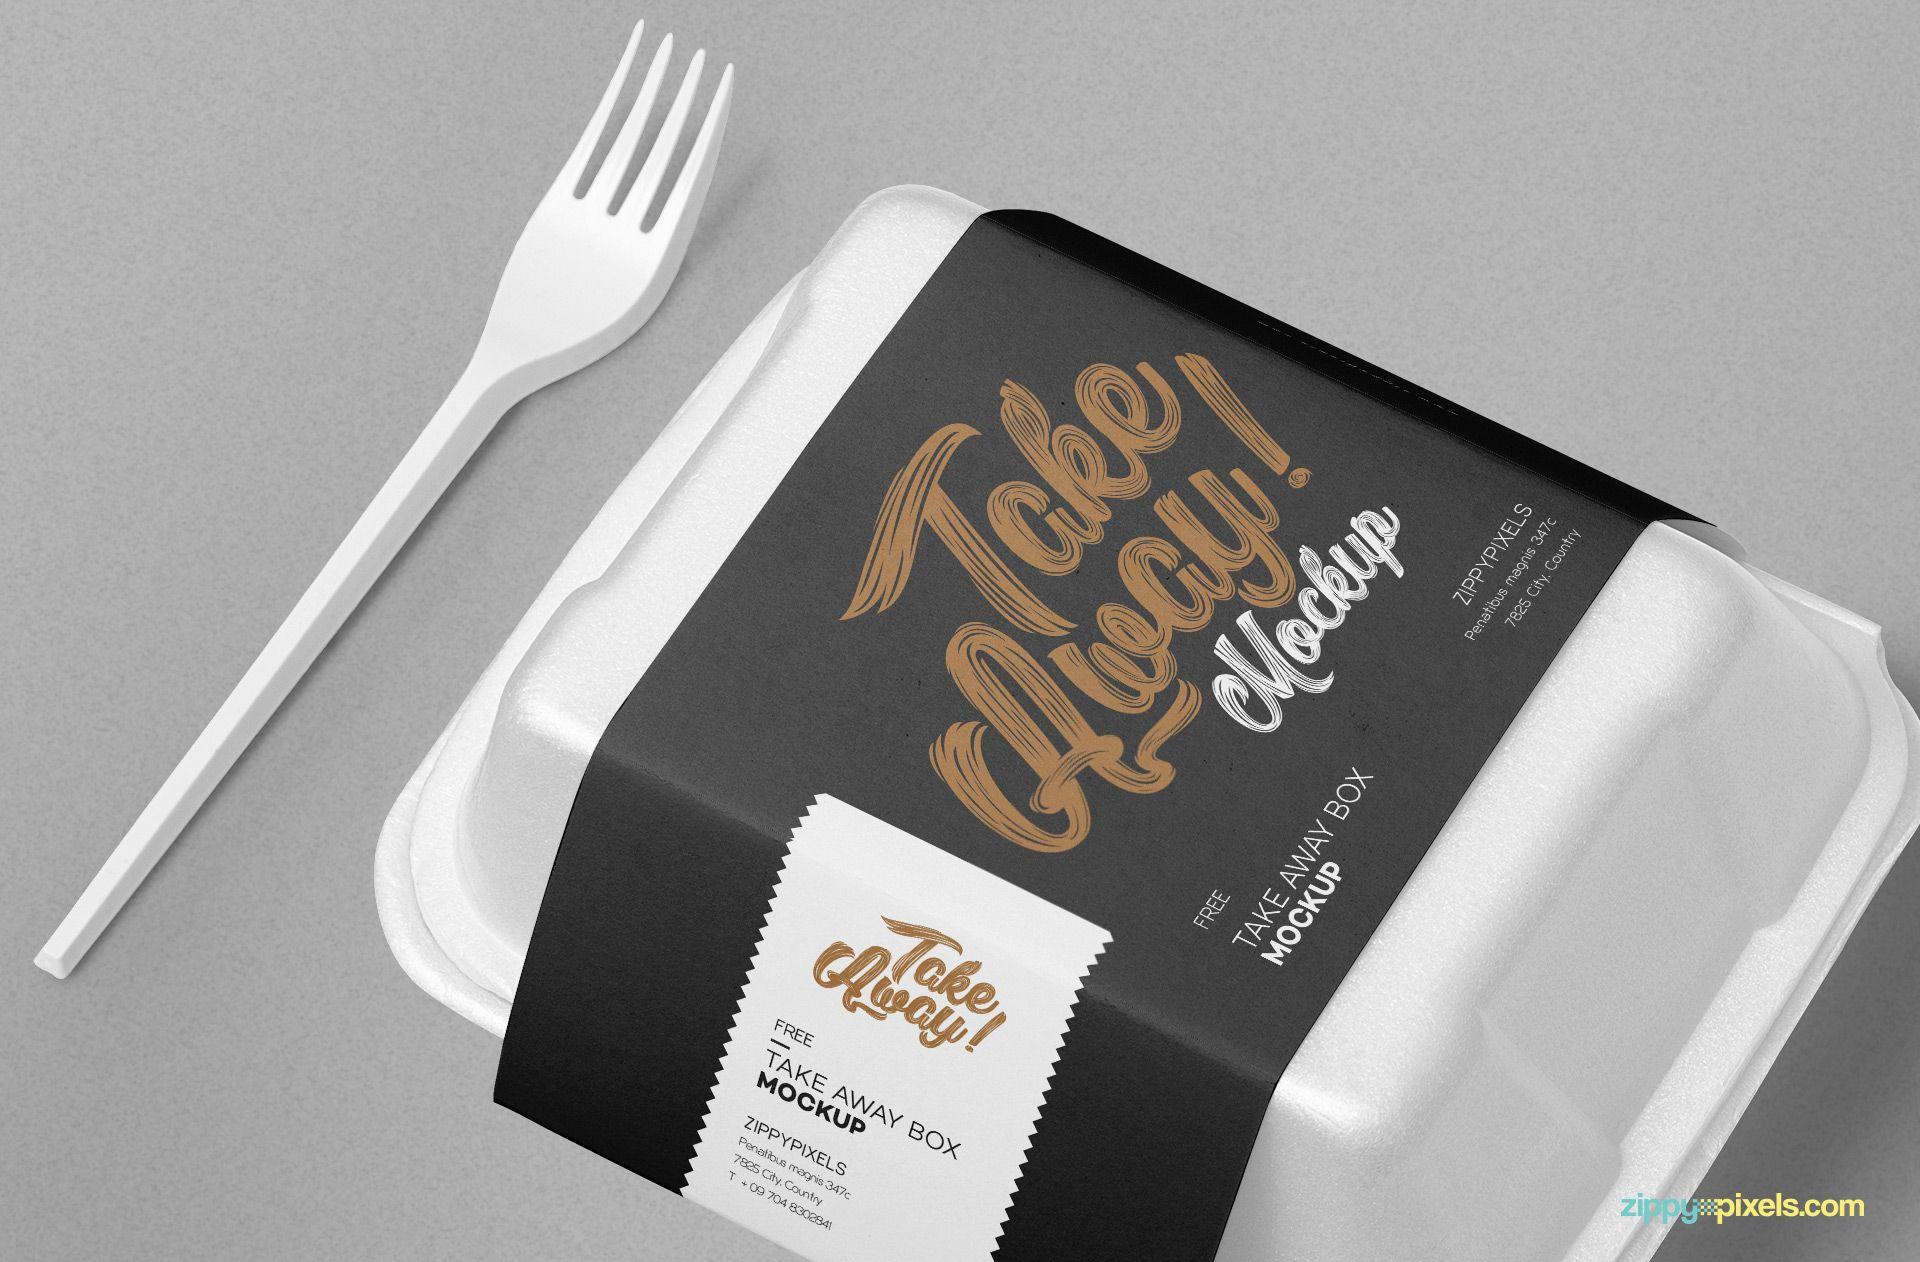 Free Disposable Food Packaging Mockup Zippypixels Food Packaging Packaging Mockup Plastic Food Containers